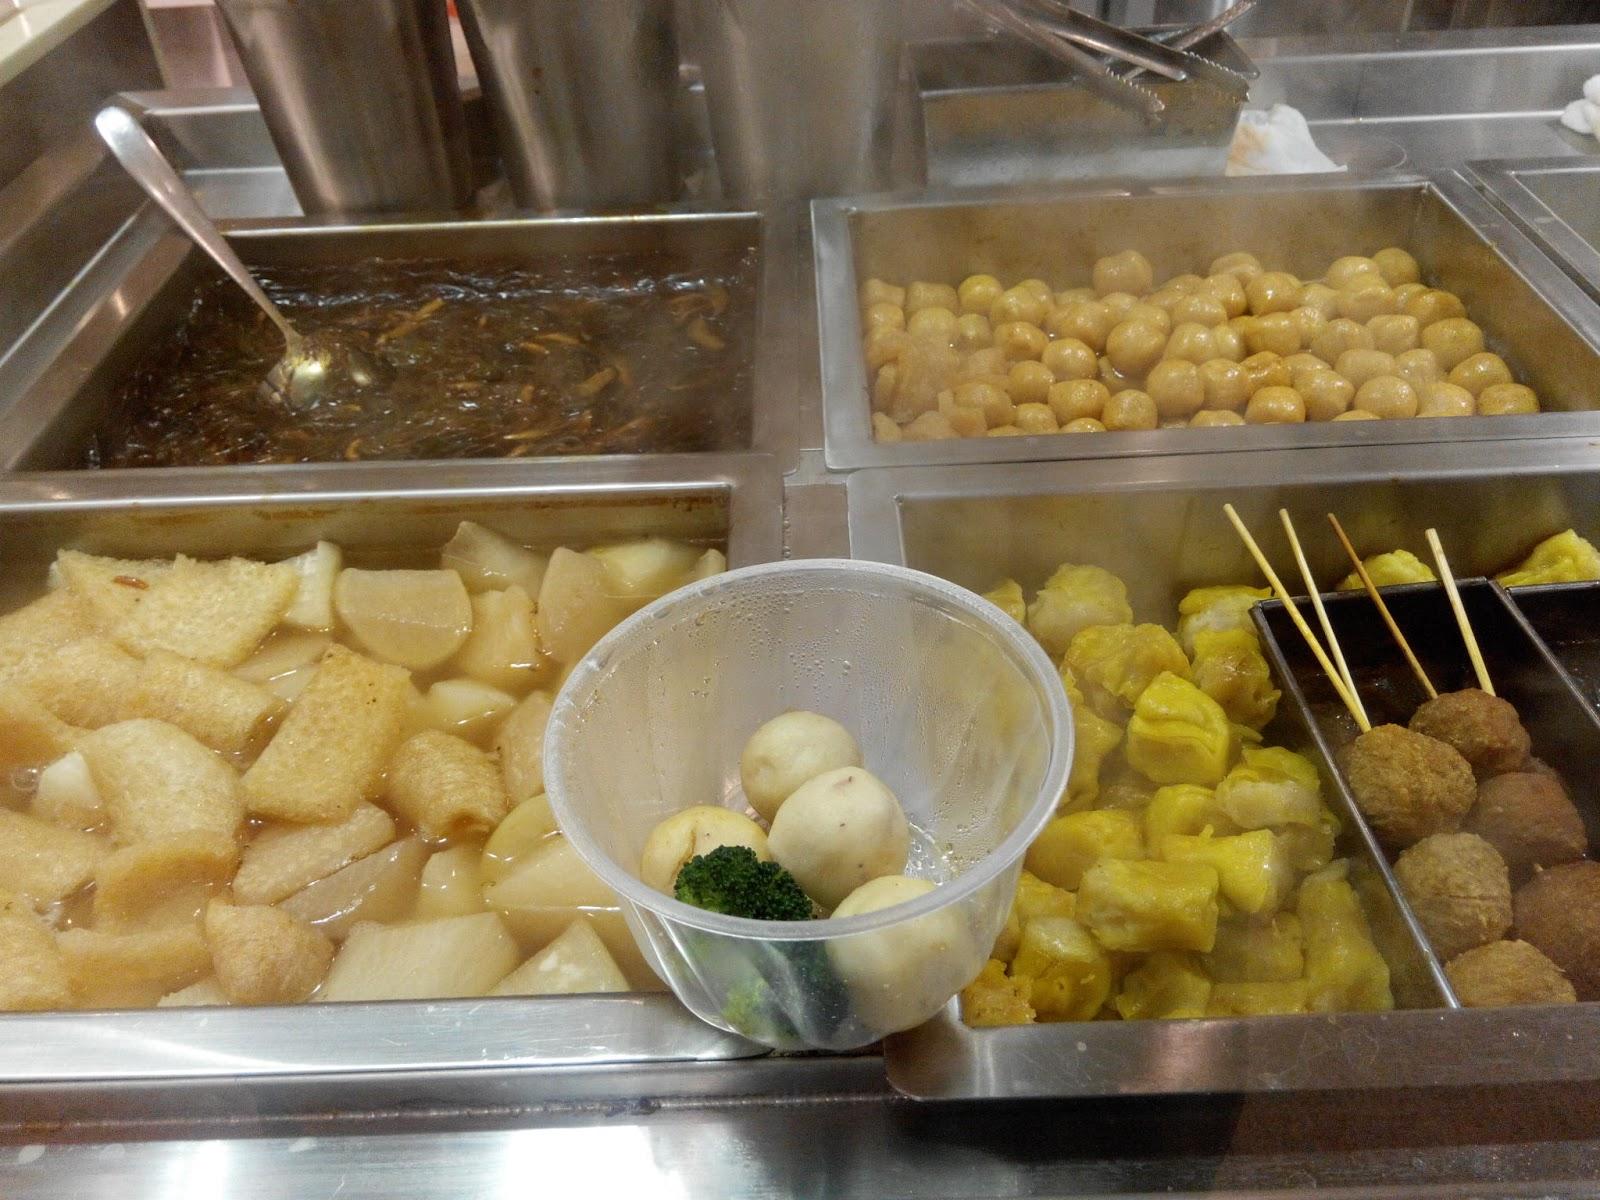 Street eats: pig skins, fish balls,